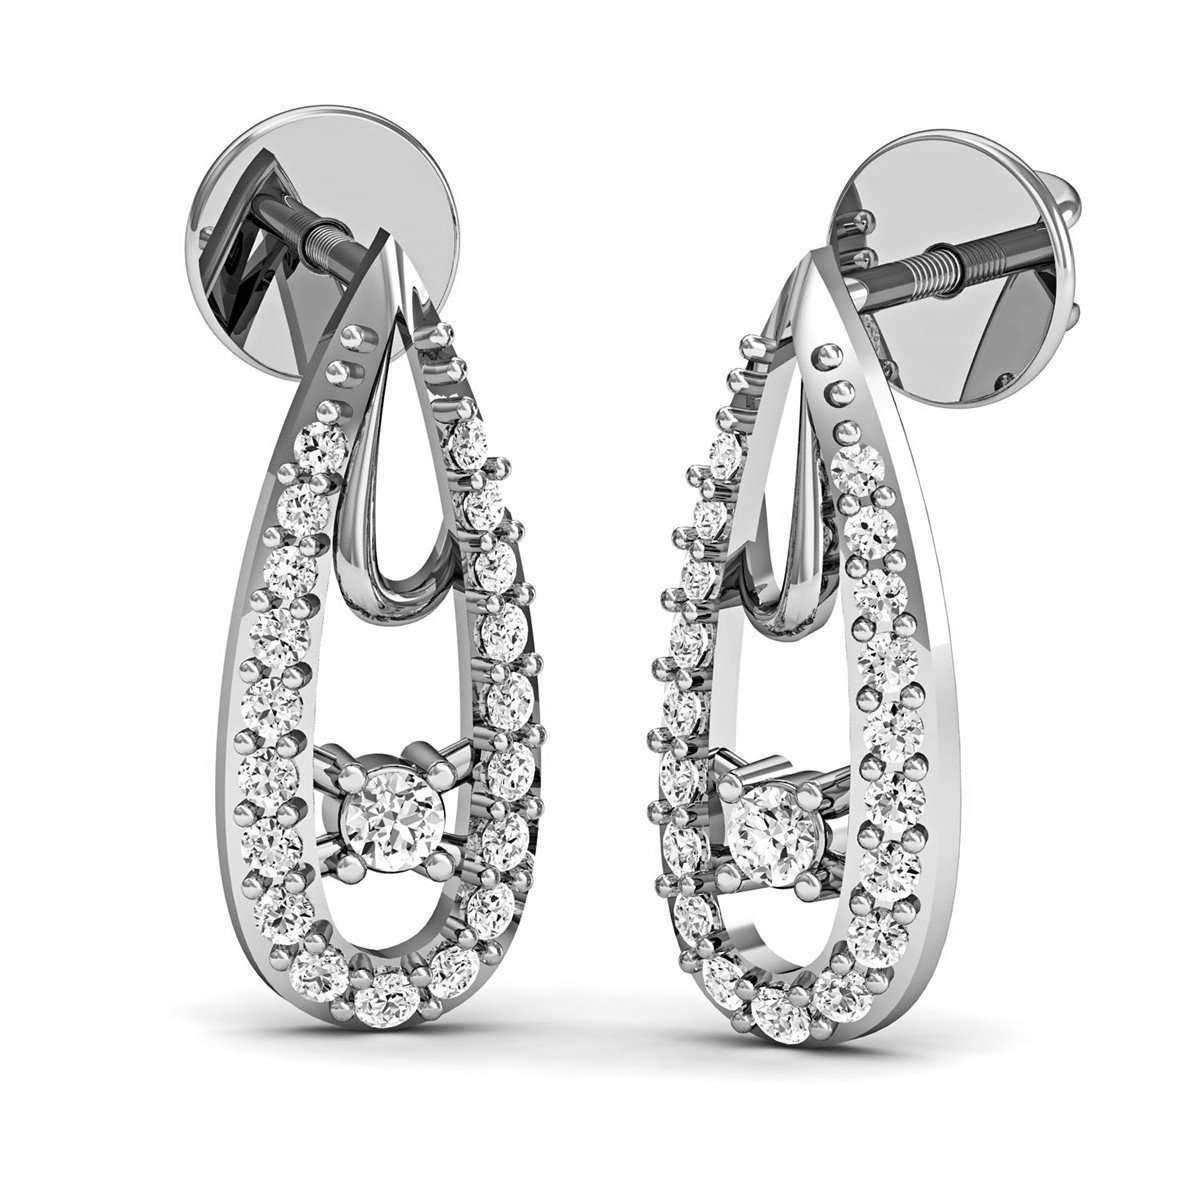 Diamoire Jewels Polished 18kt White Gold Inspired by nature Diamond Earrings ASgkvQk